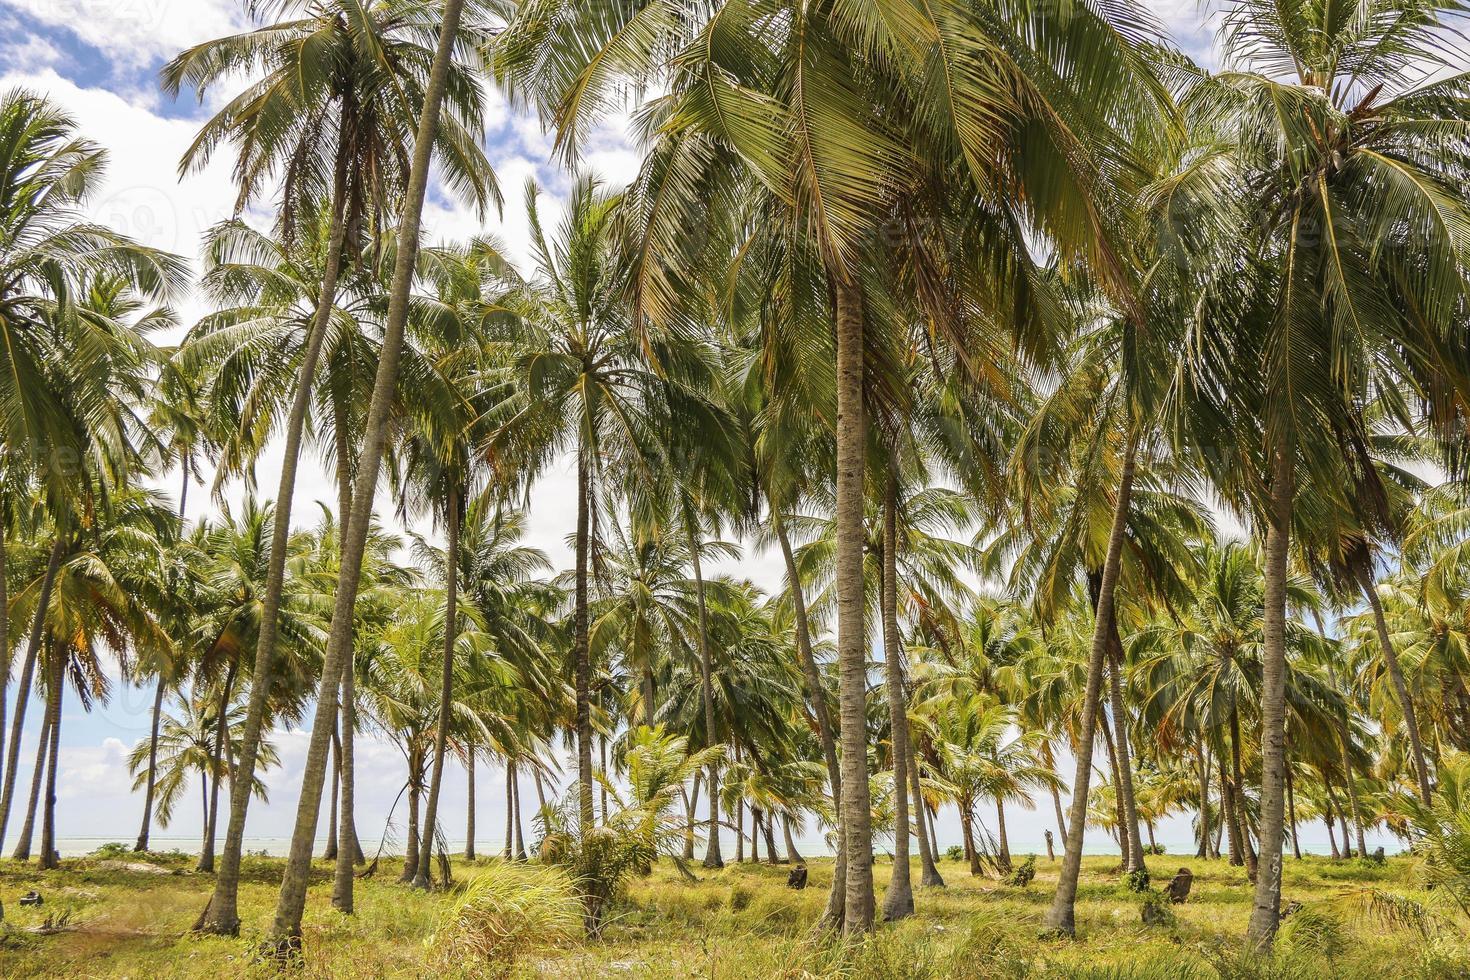 palmbomen dromen foto